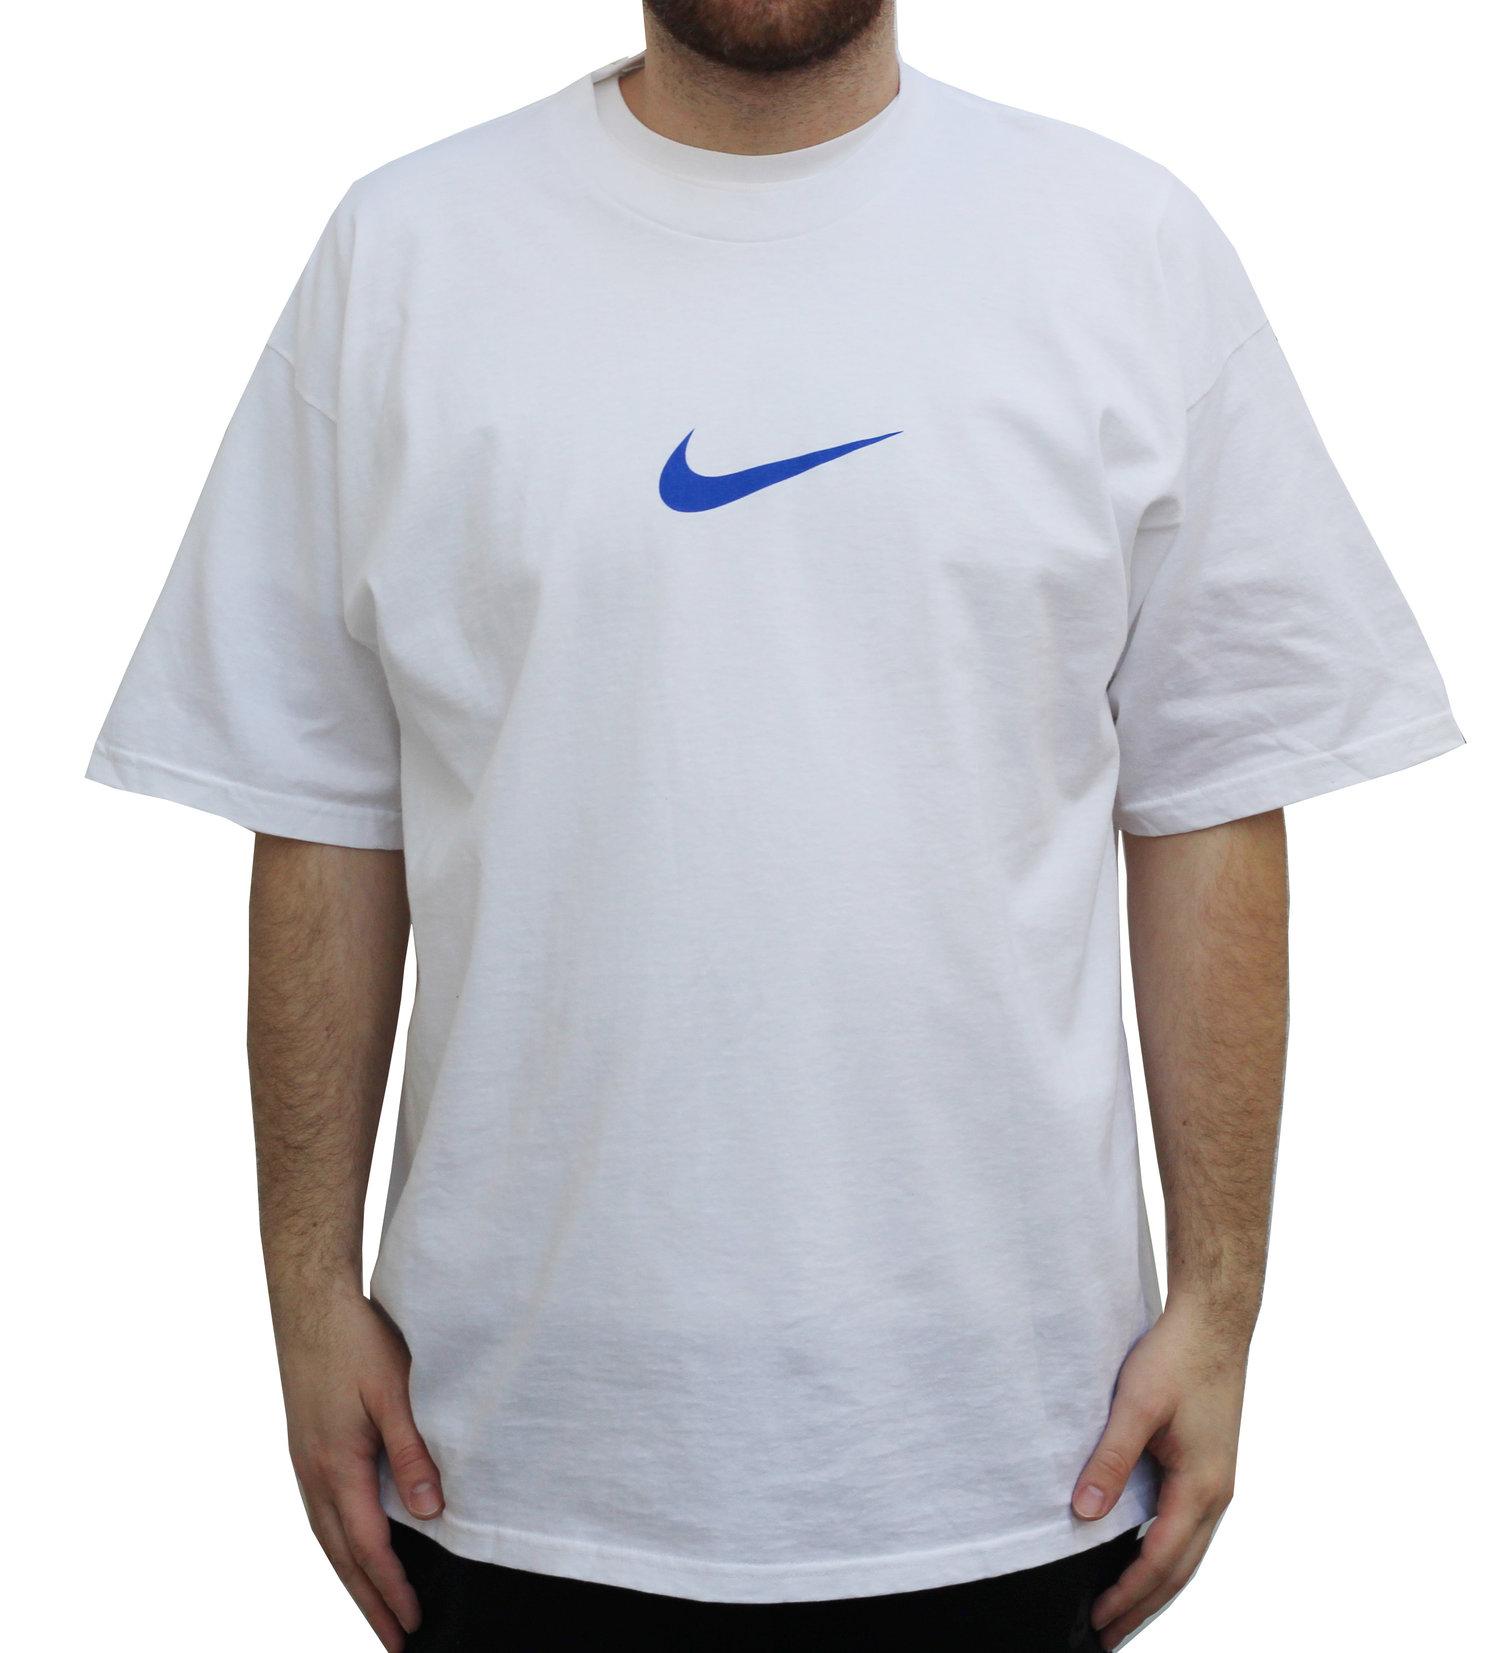 0f97699ba7d Big And Tall Nike Tee Shirts - DREAMWORKS